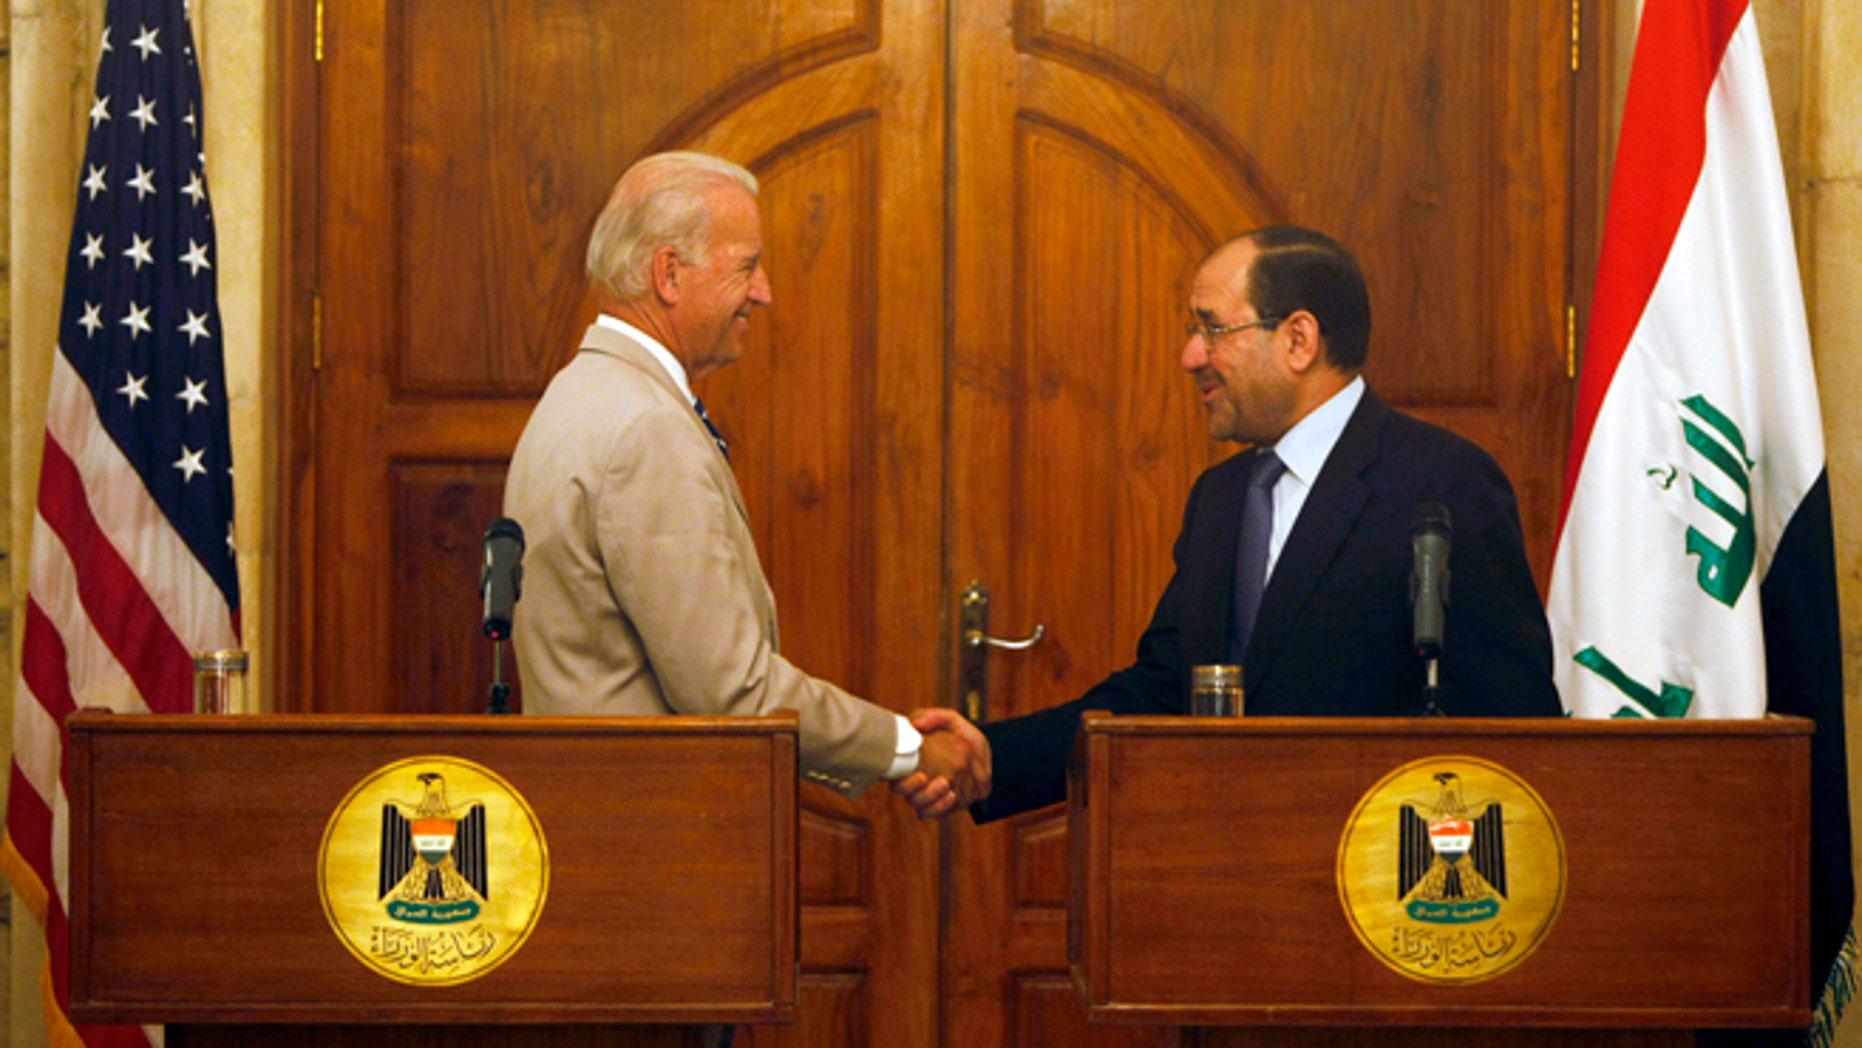 U.S. Vice President Joseph Biden and Iraqi Prime Minister Nuri al-Maliki (R) shake hands in Baghdad July 3, 2009.